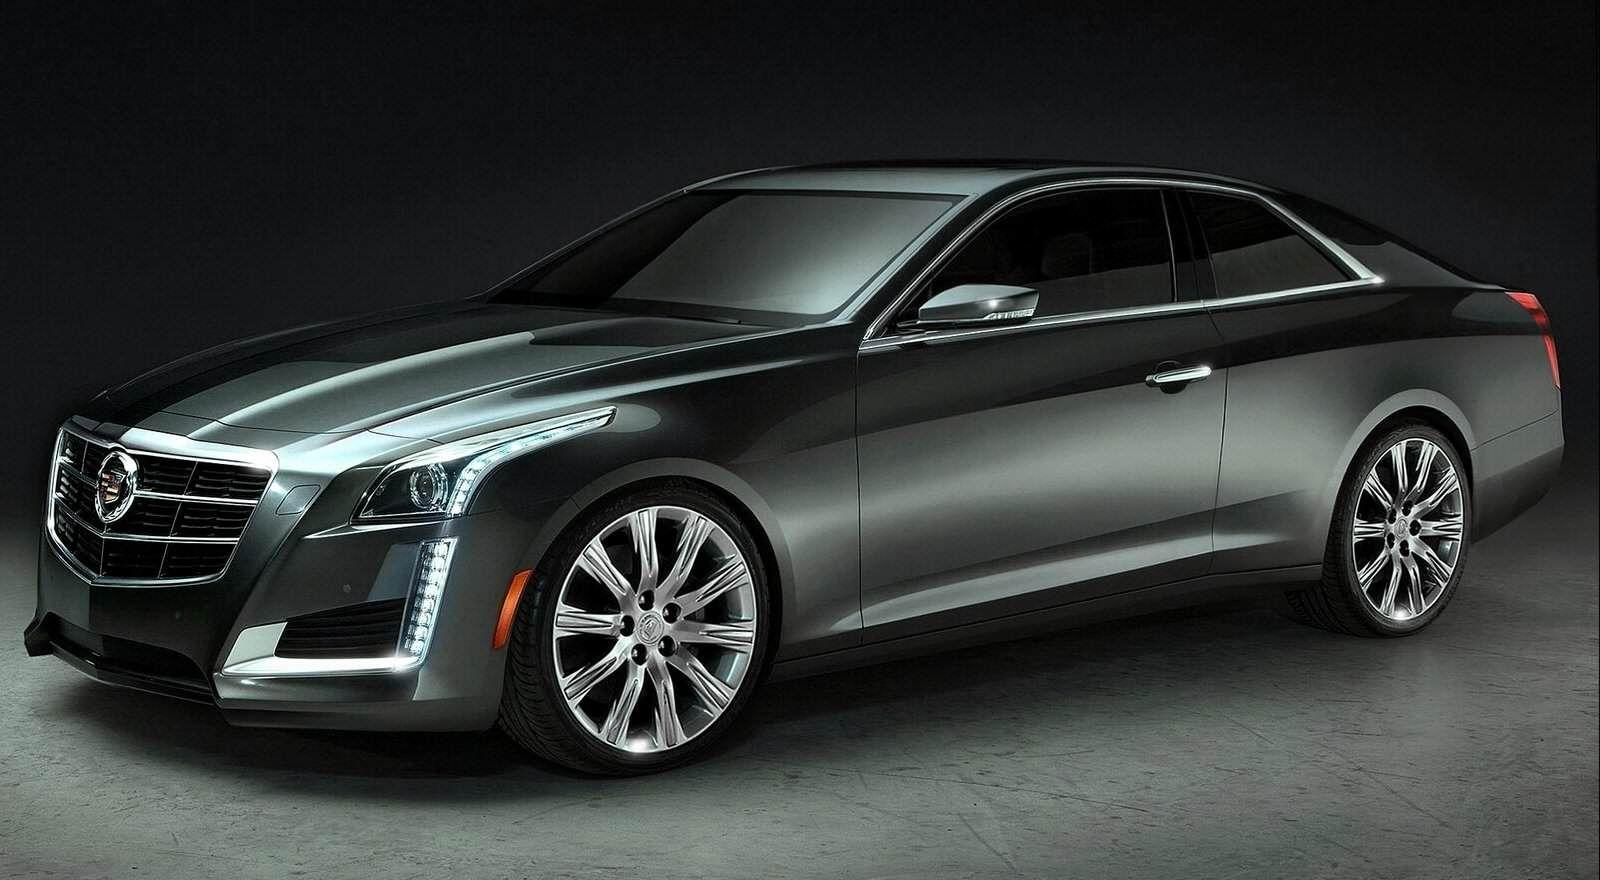 2015 Cadillac Xts Vsport Platinum Cadillac Xts Platinum Review